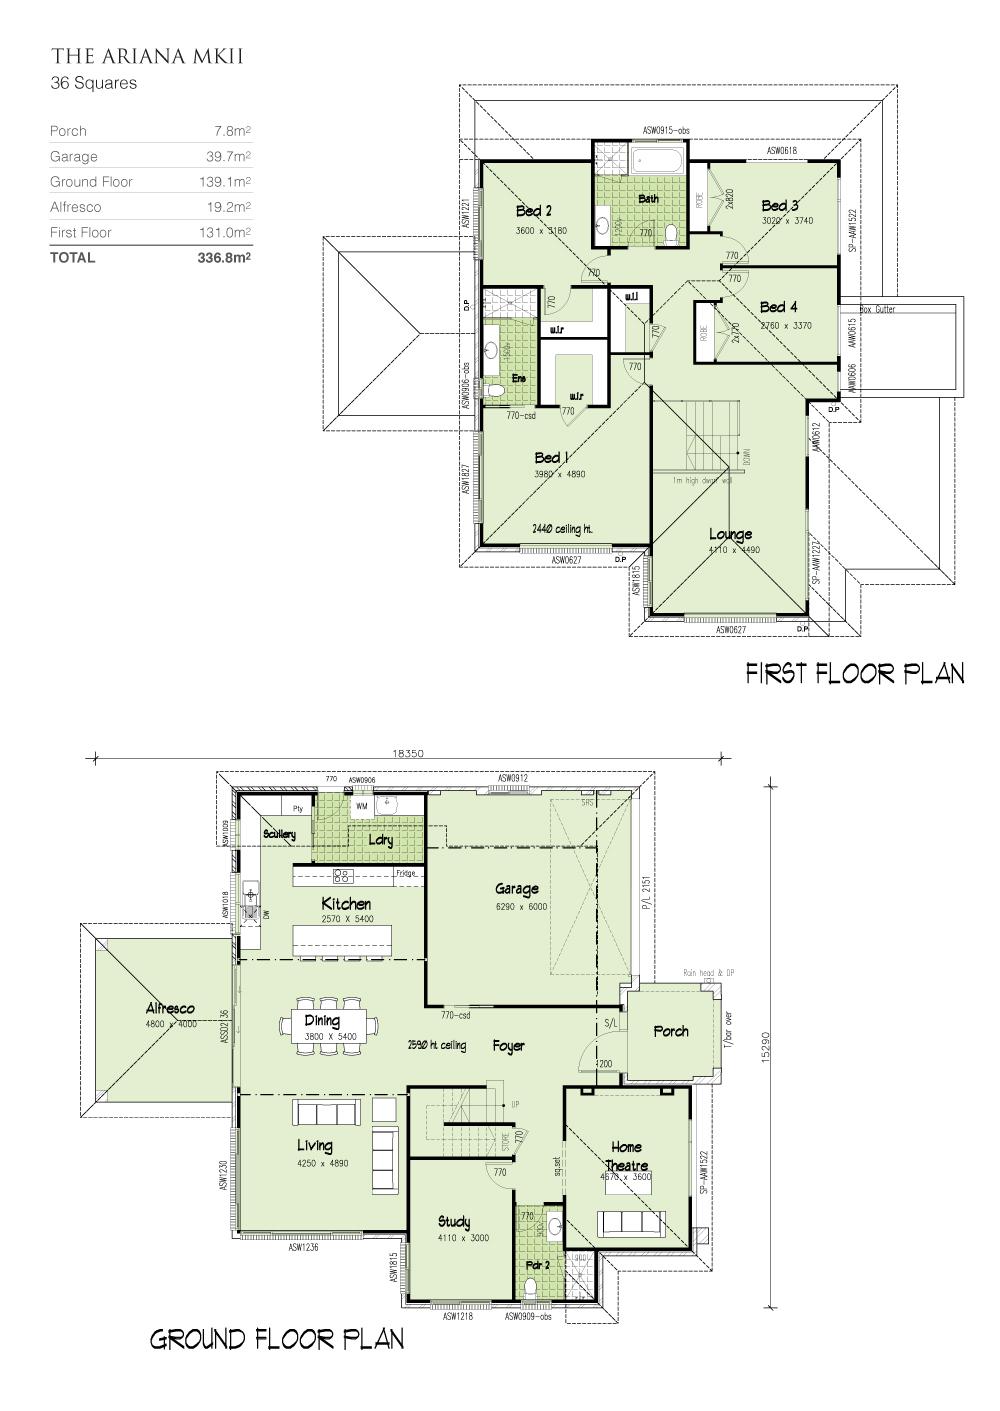 Ariana MKII, Home Design, Tullipan Homes